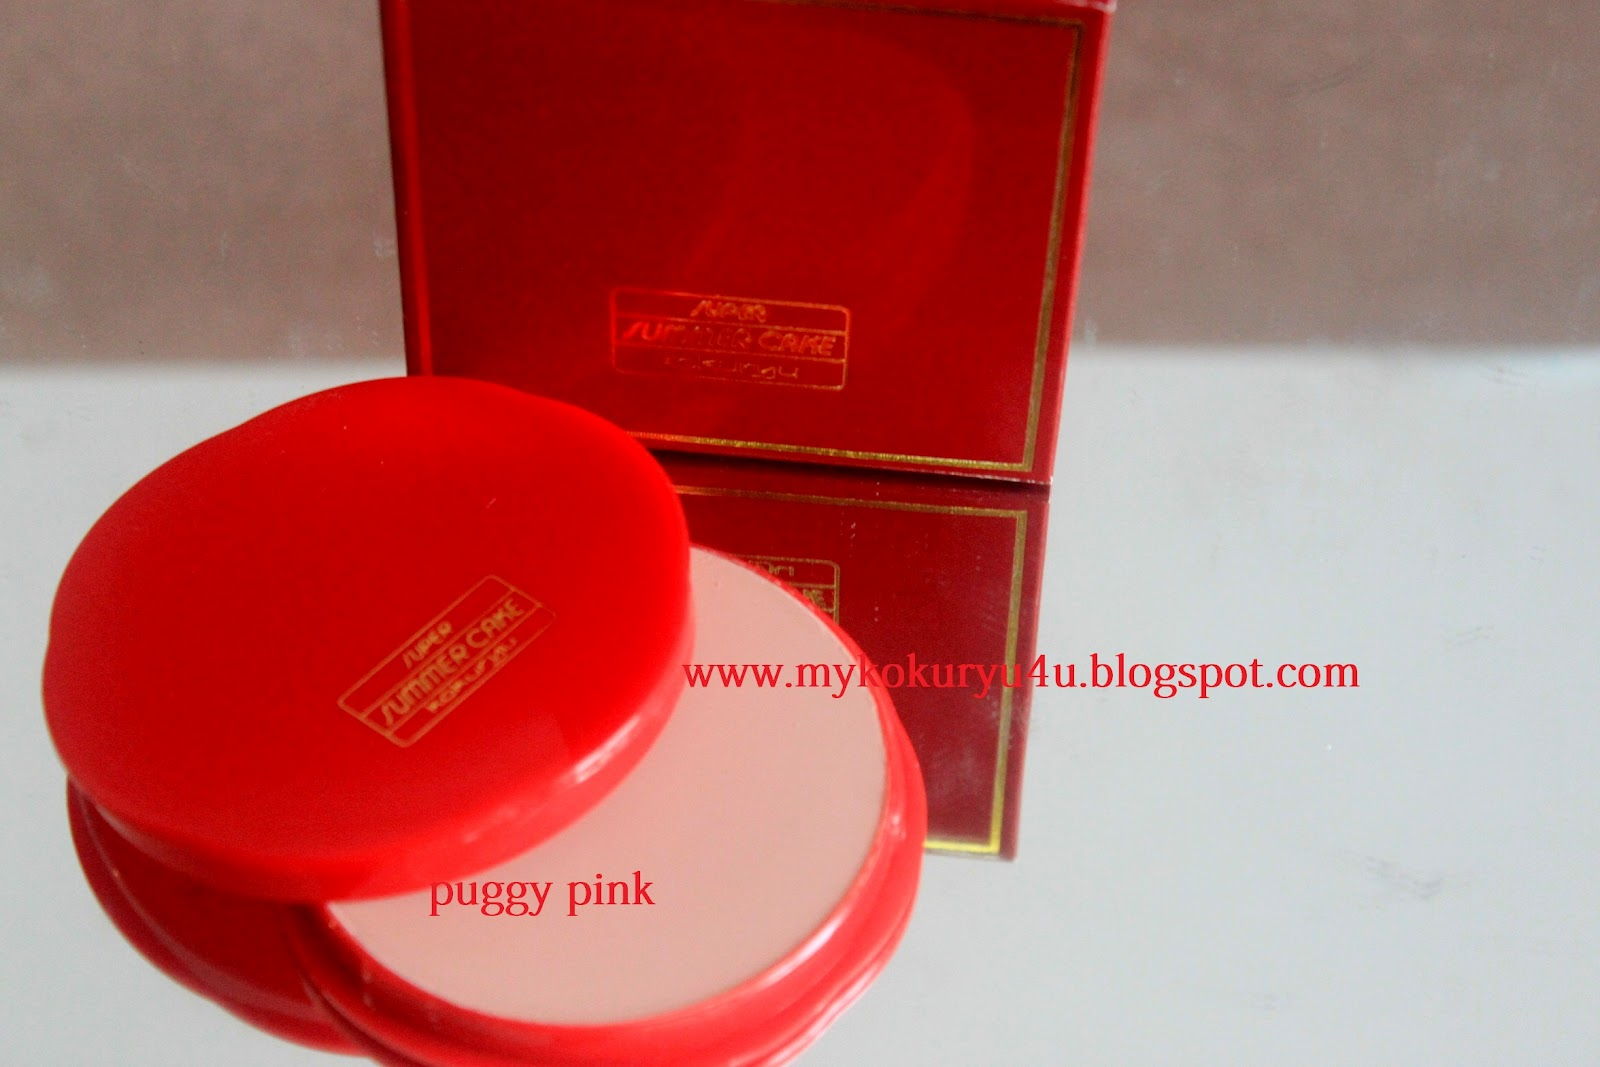 Beside russet,and orange blush puggy pink